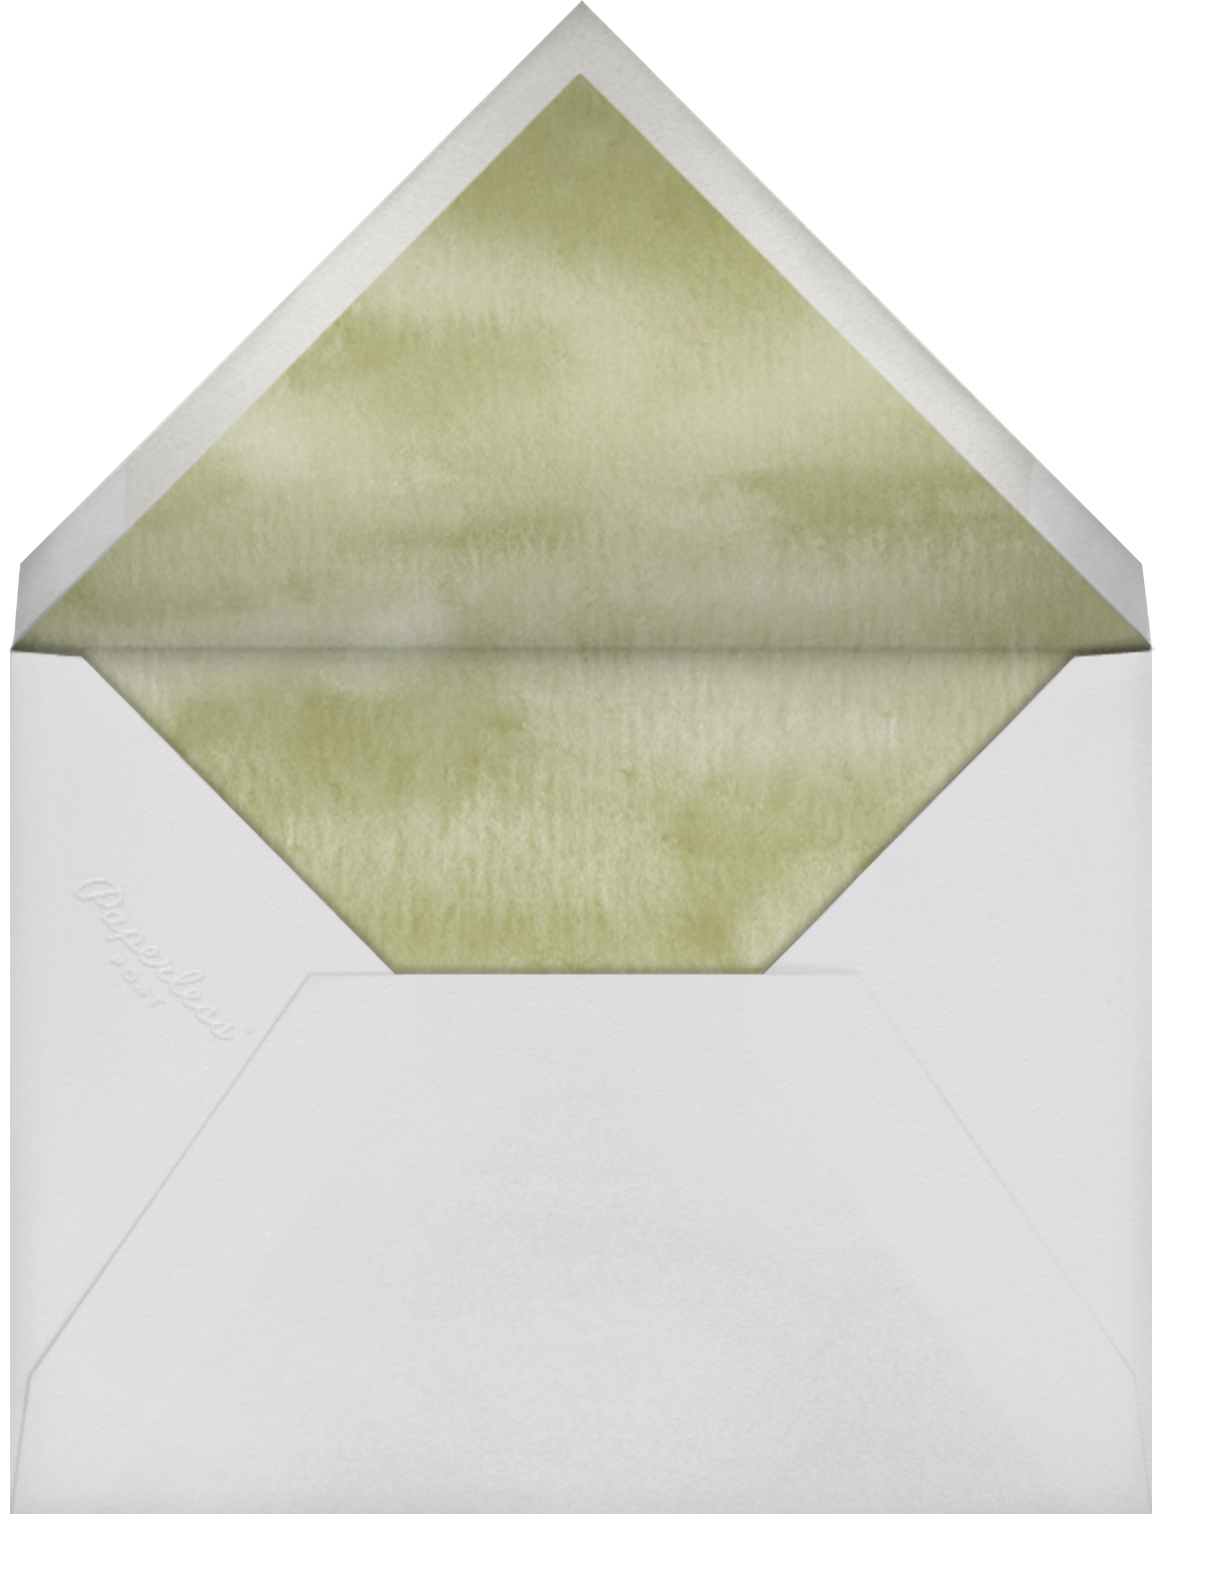 Buckhannon (Invitation) - Felix Doolittle - All - envelope back